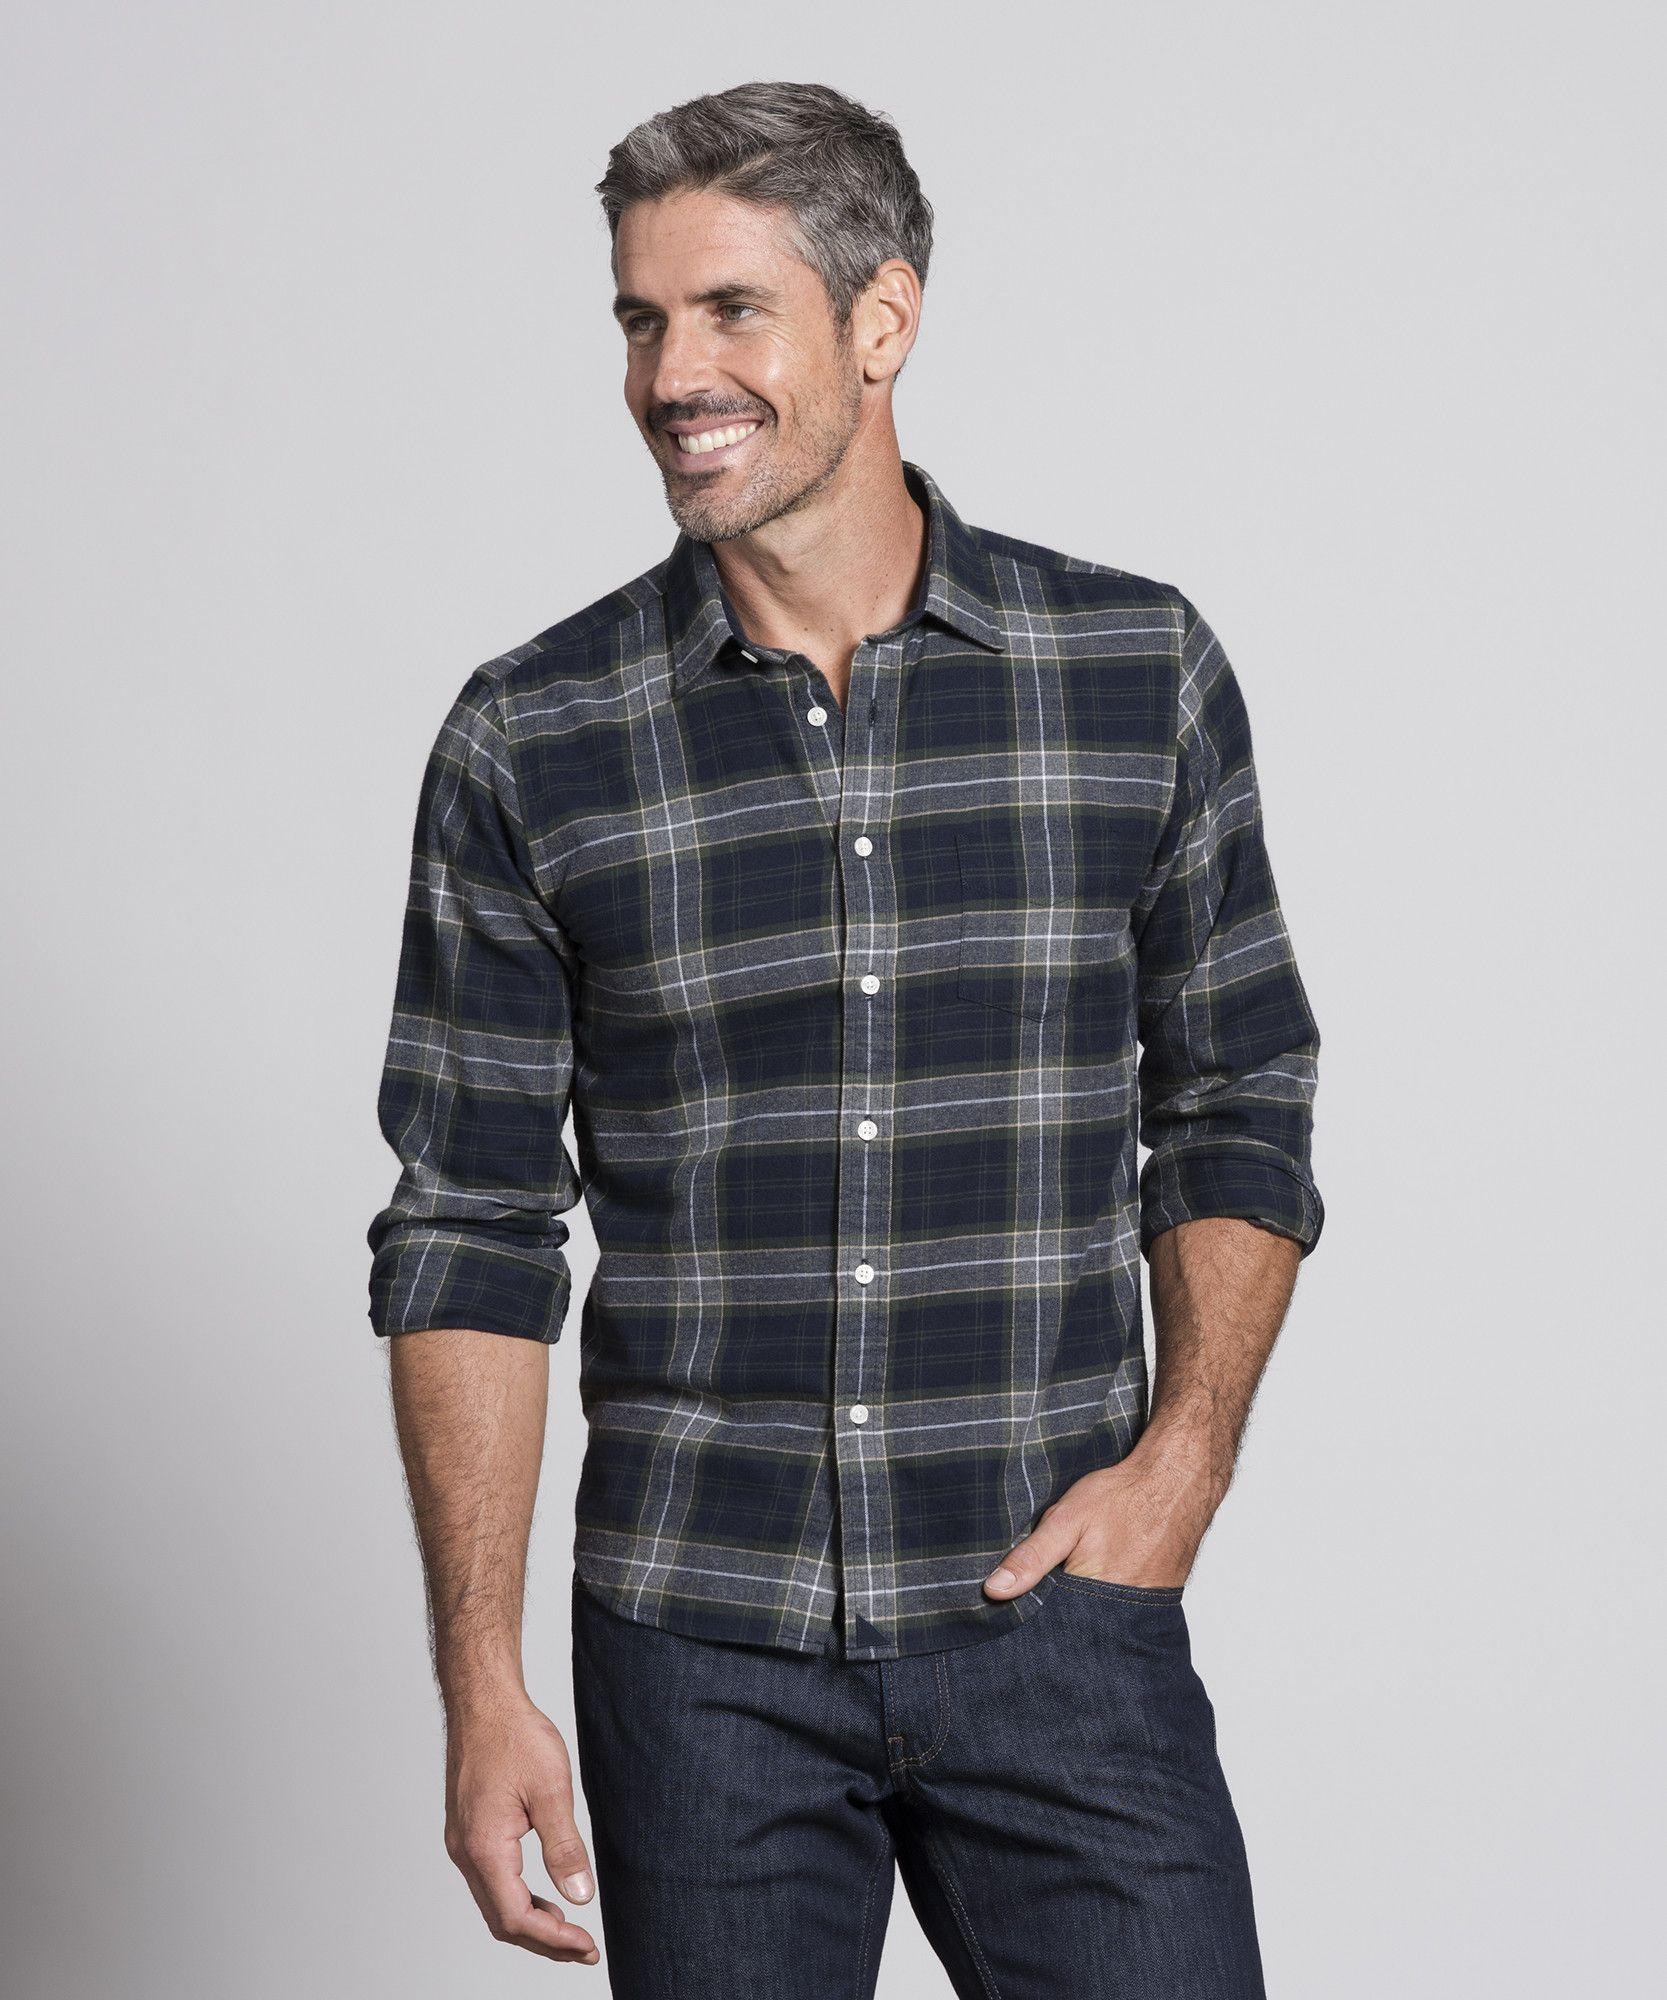 Argiano Mens travel style, Mens shirts, Plaid flannel shirt